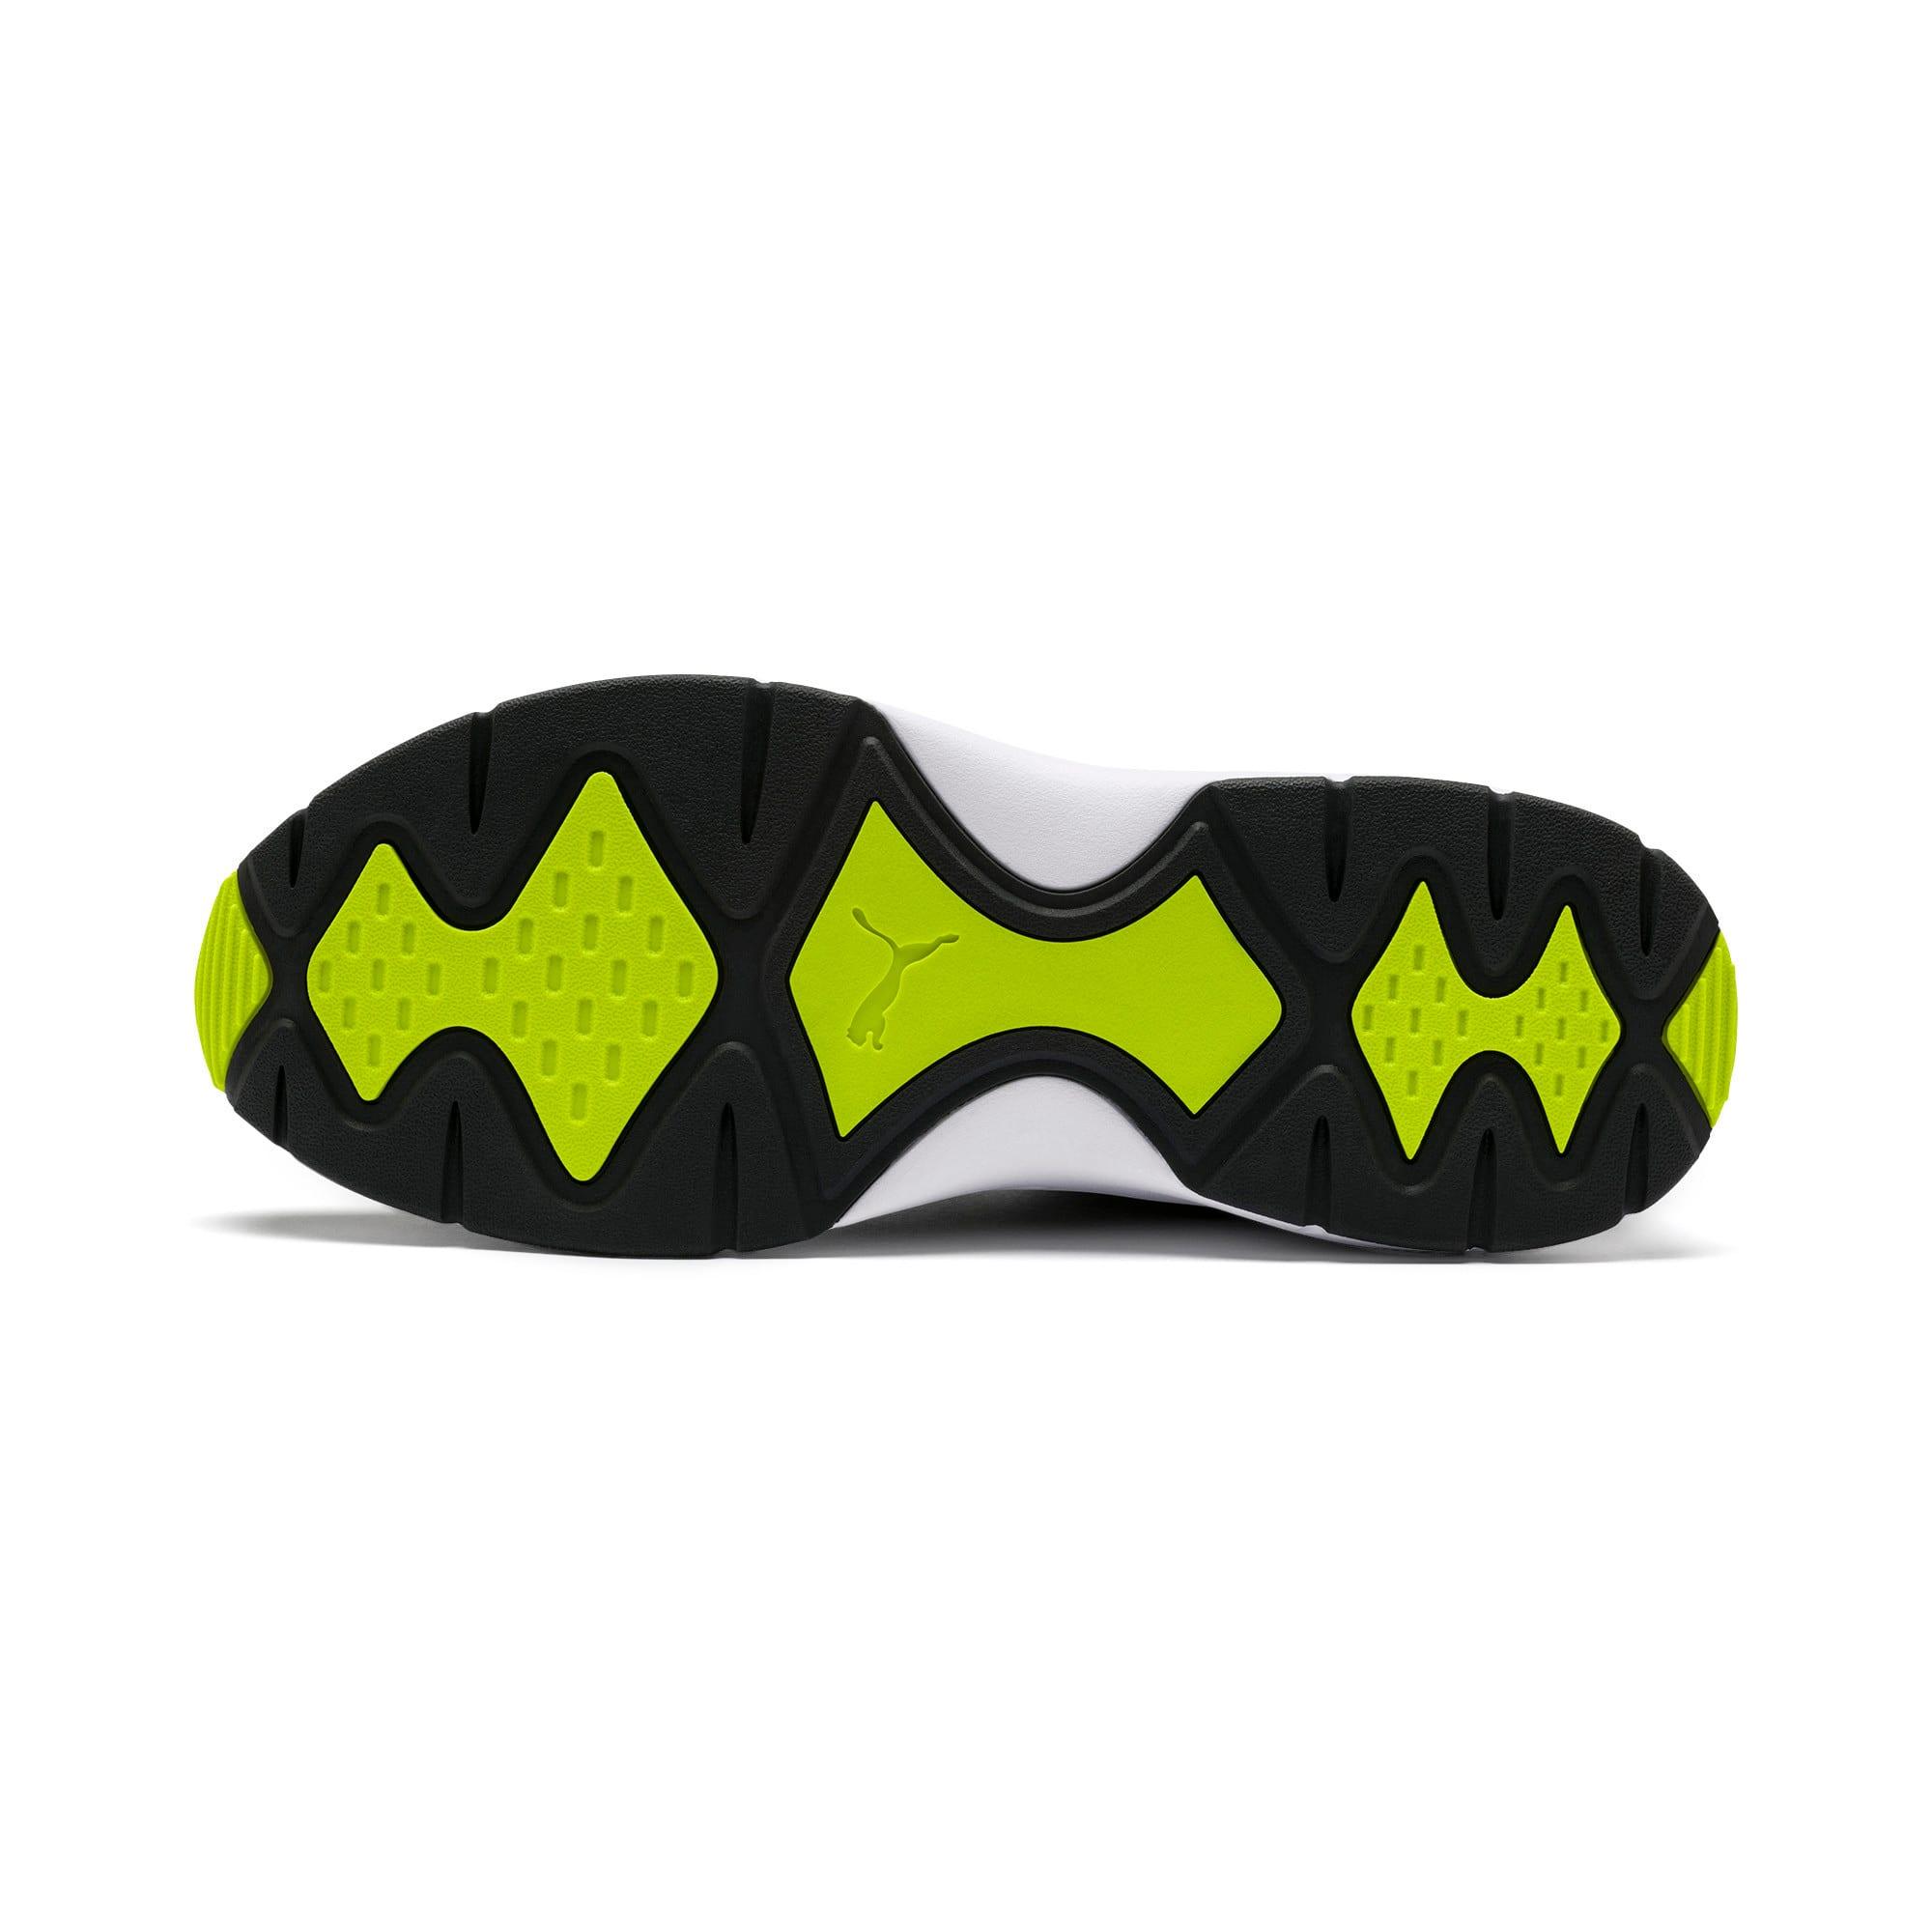 Thumbnail 5 of Nucleus Run Training Shoes, CASTLEROCK-Limepunch, medium